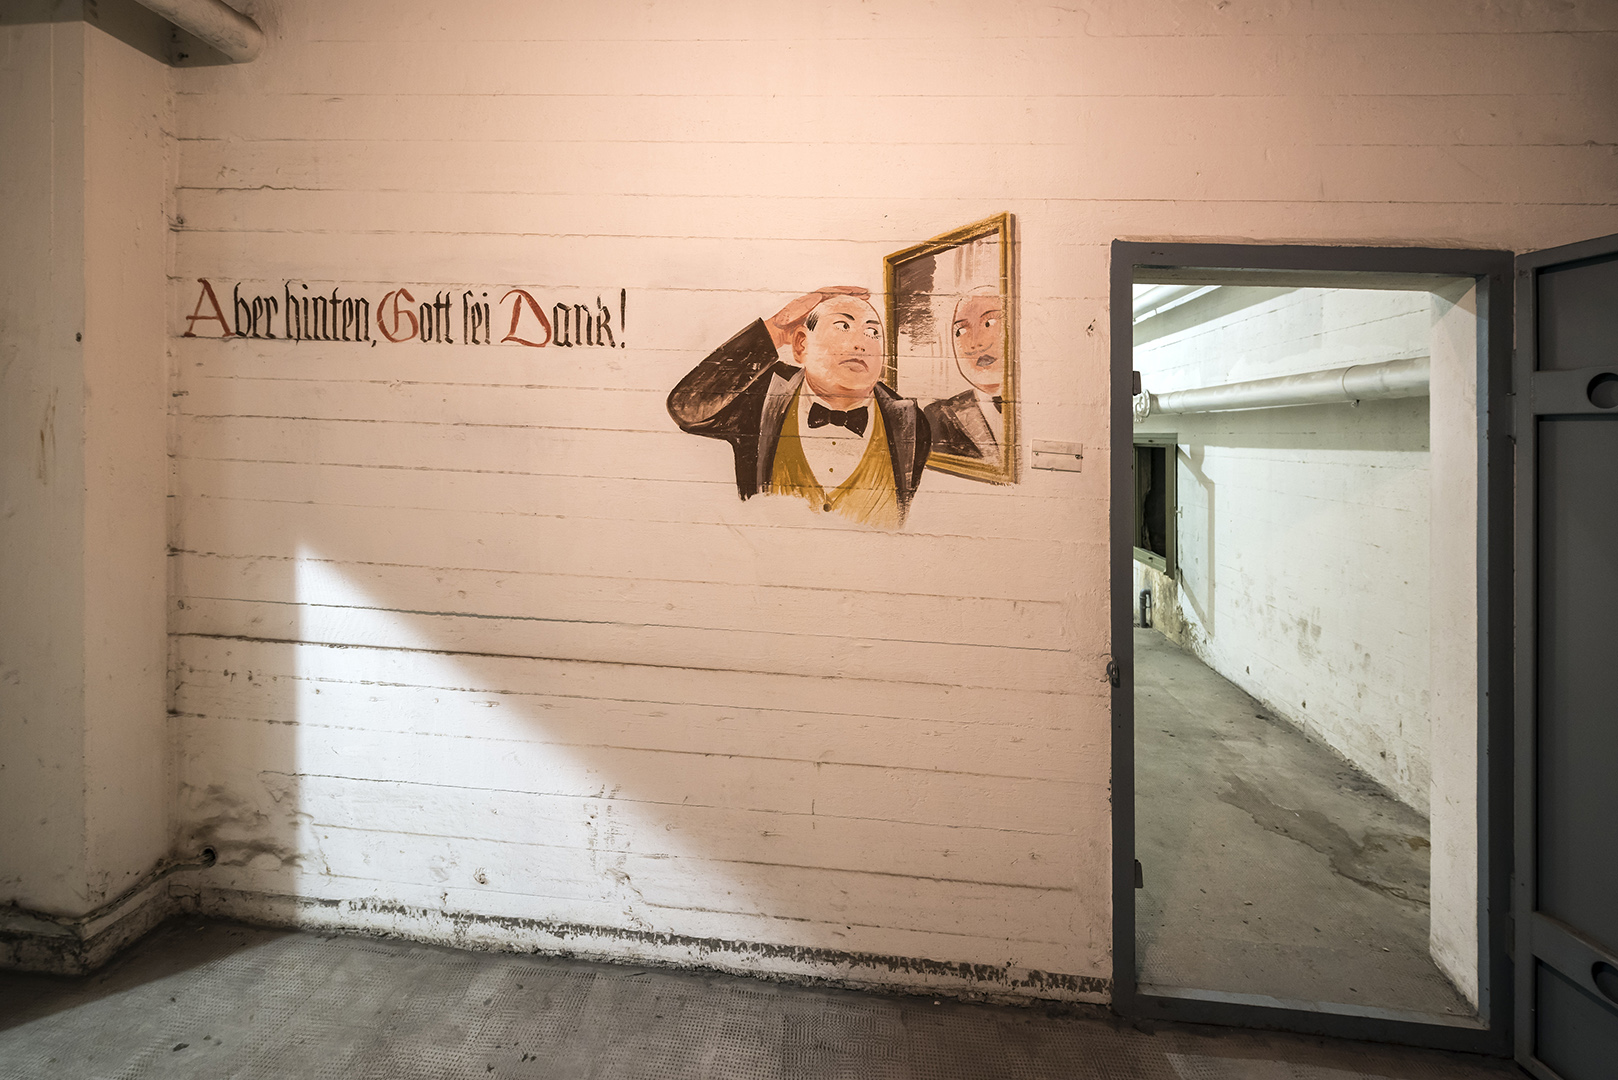 Schutzräume im Keller vom ehemaligen Flughafen Tempelhof. Steht unter Denkmalschutz. Berlin-Tempelhof, 16.01.2017